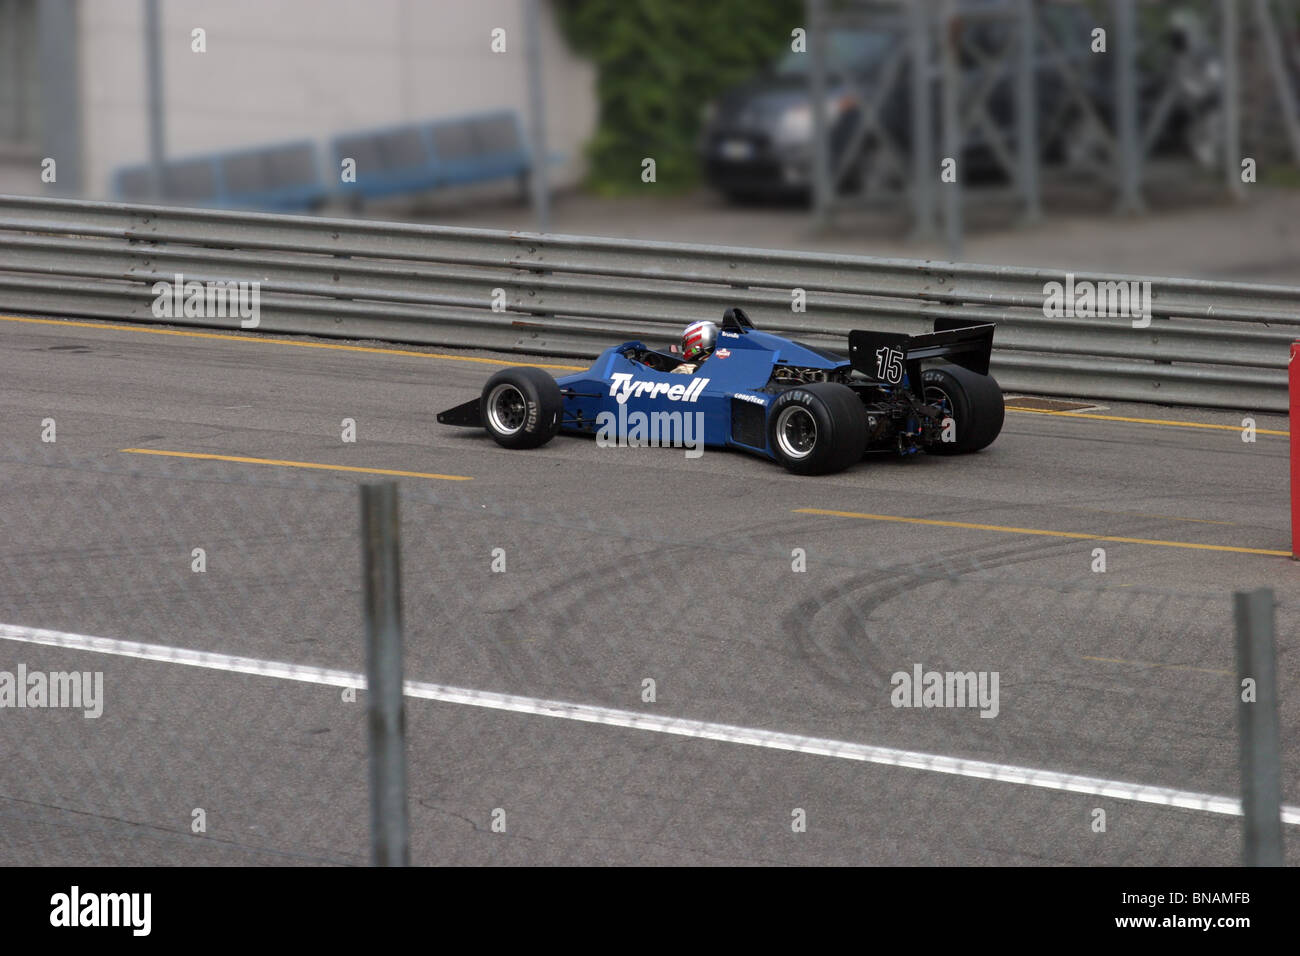 Formula 1 Race car  - Stock Image